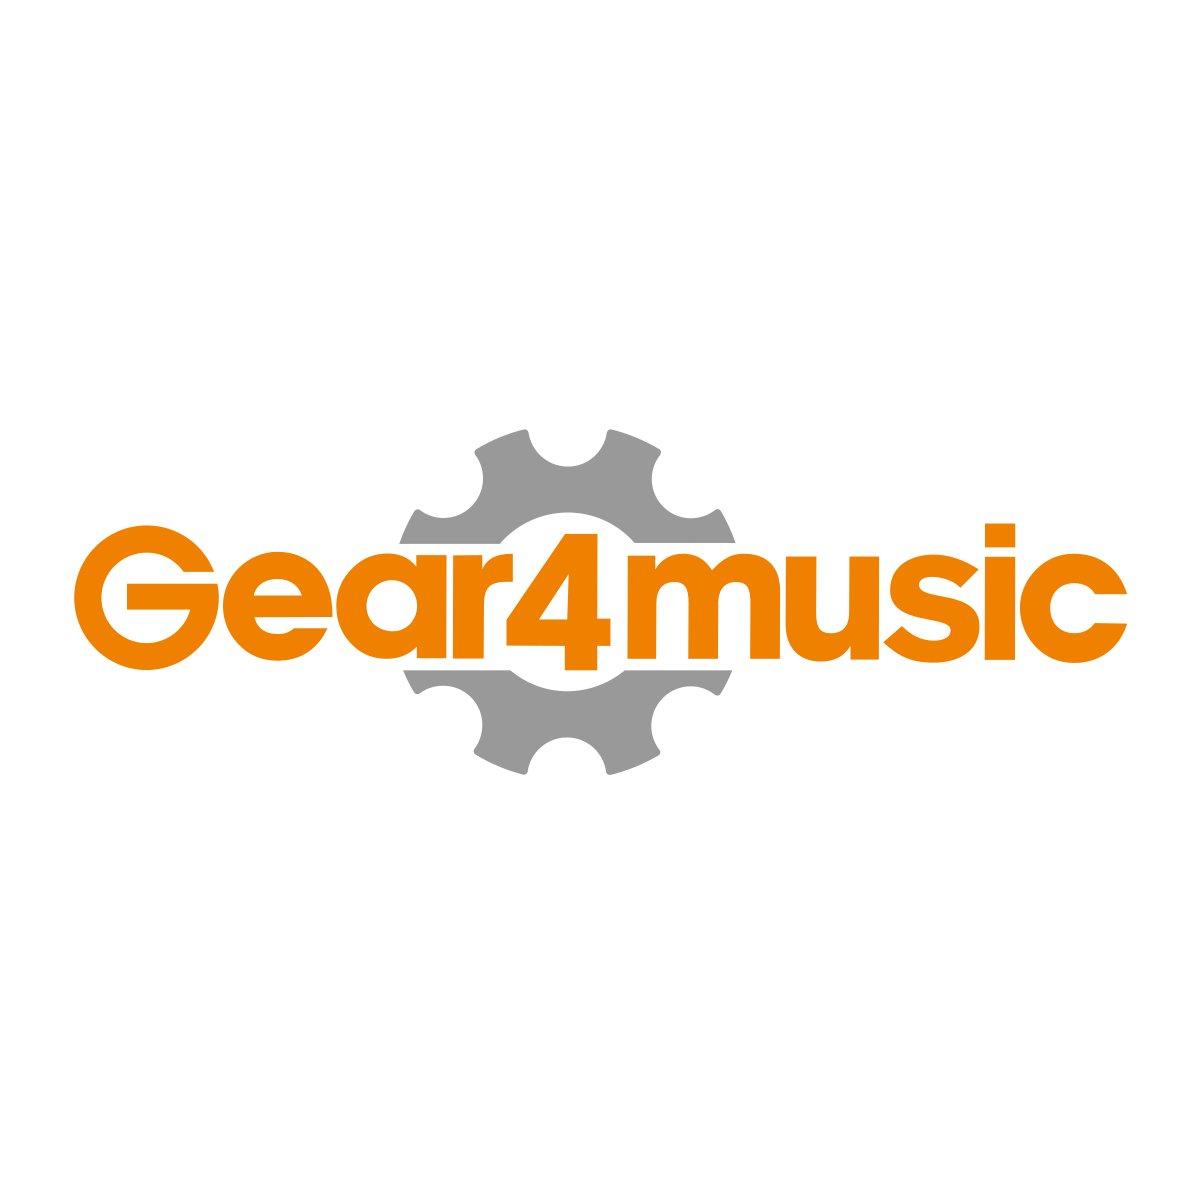 Custodia per chitarra elettrica in ABS, Gear4music